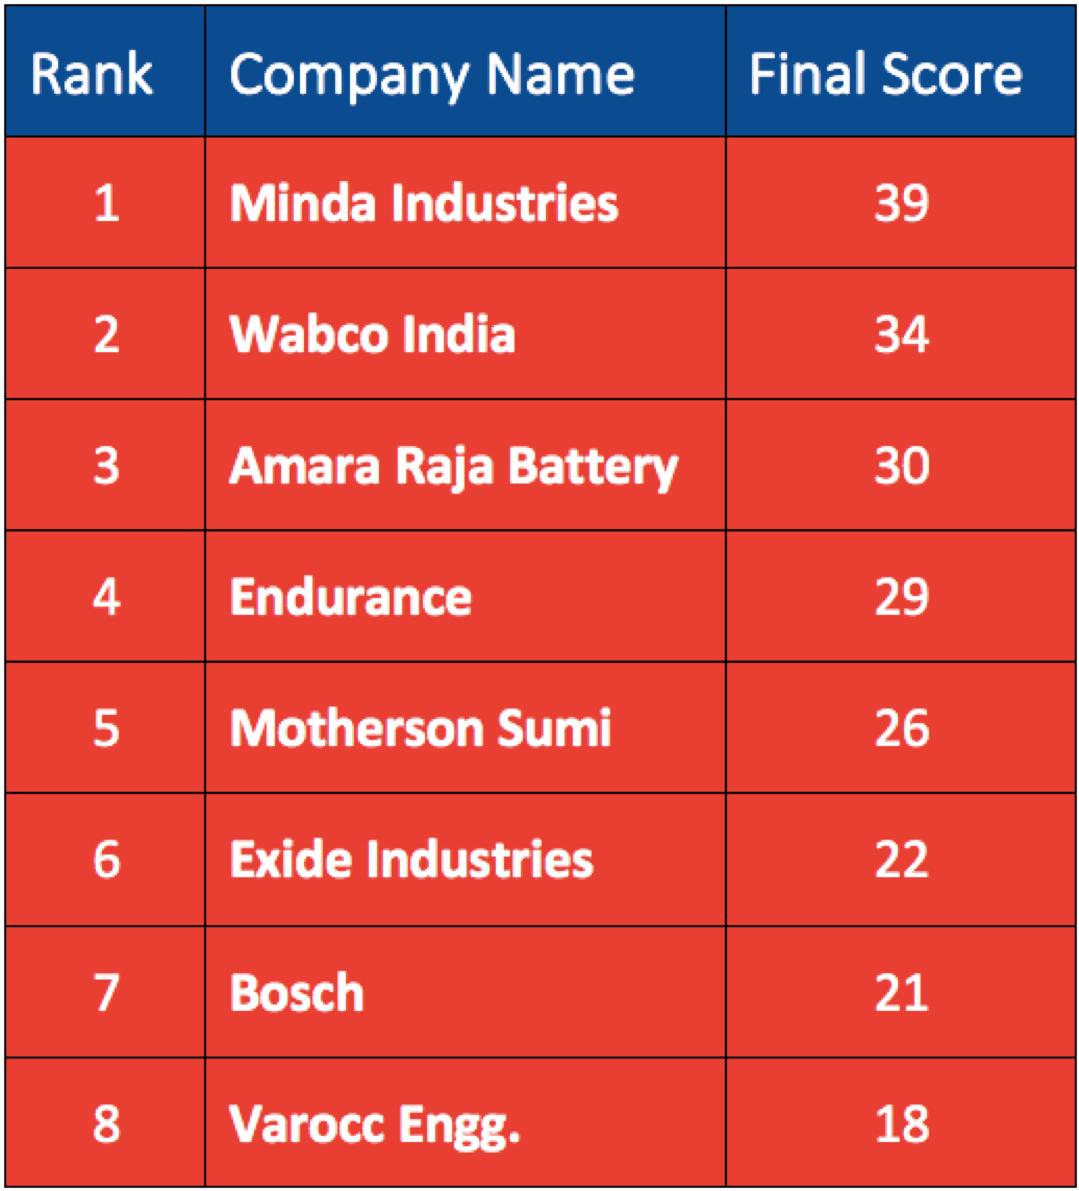 Auto Ancillary industry in India